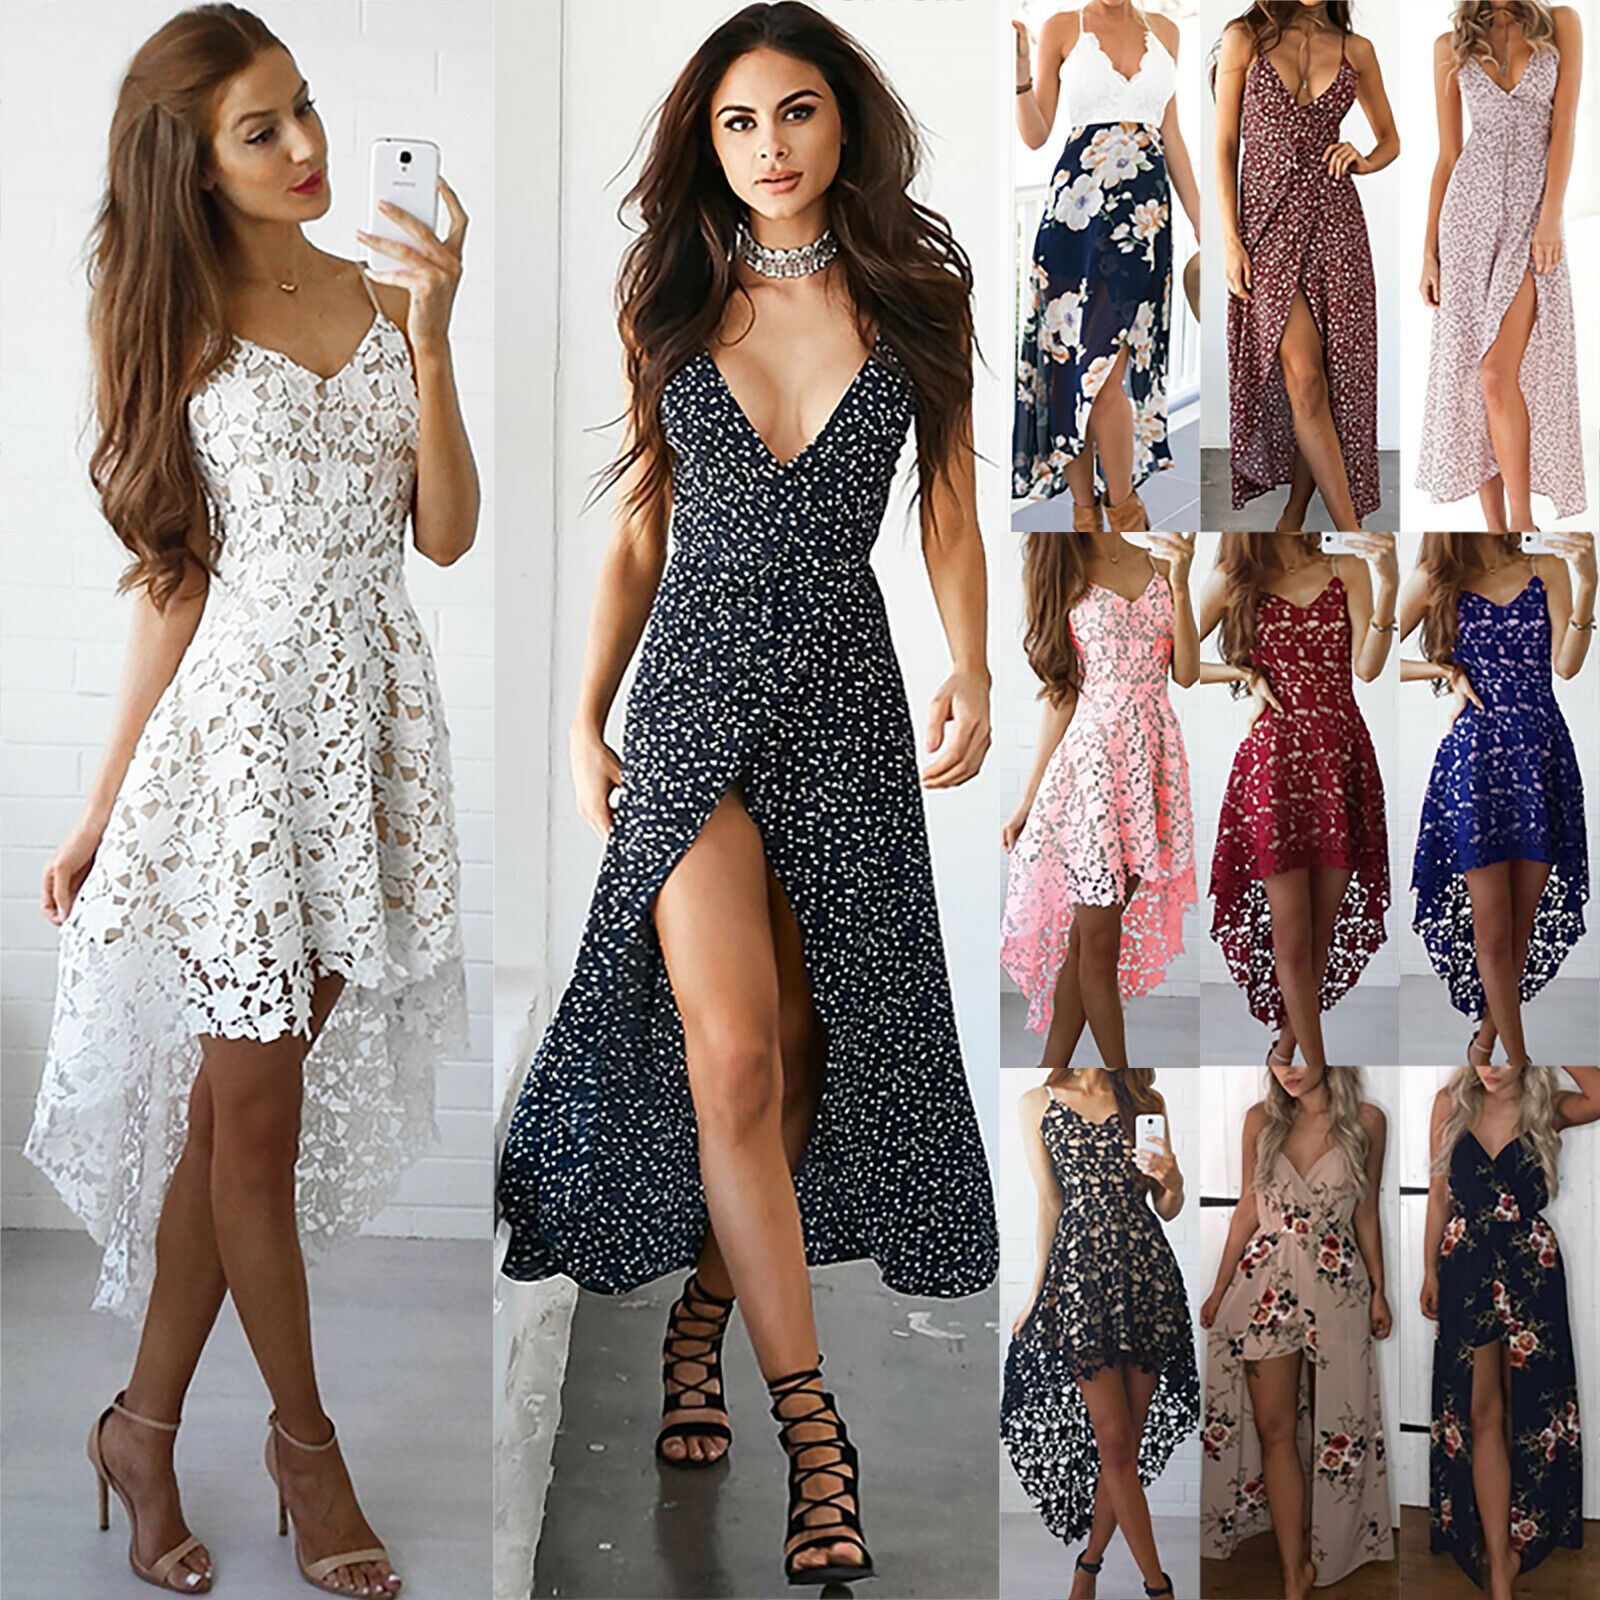 Ladies Dress Women/'s Prom Sundress Dress Casual Cocktail V Neck Formal